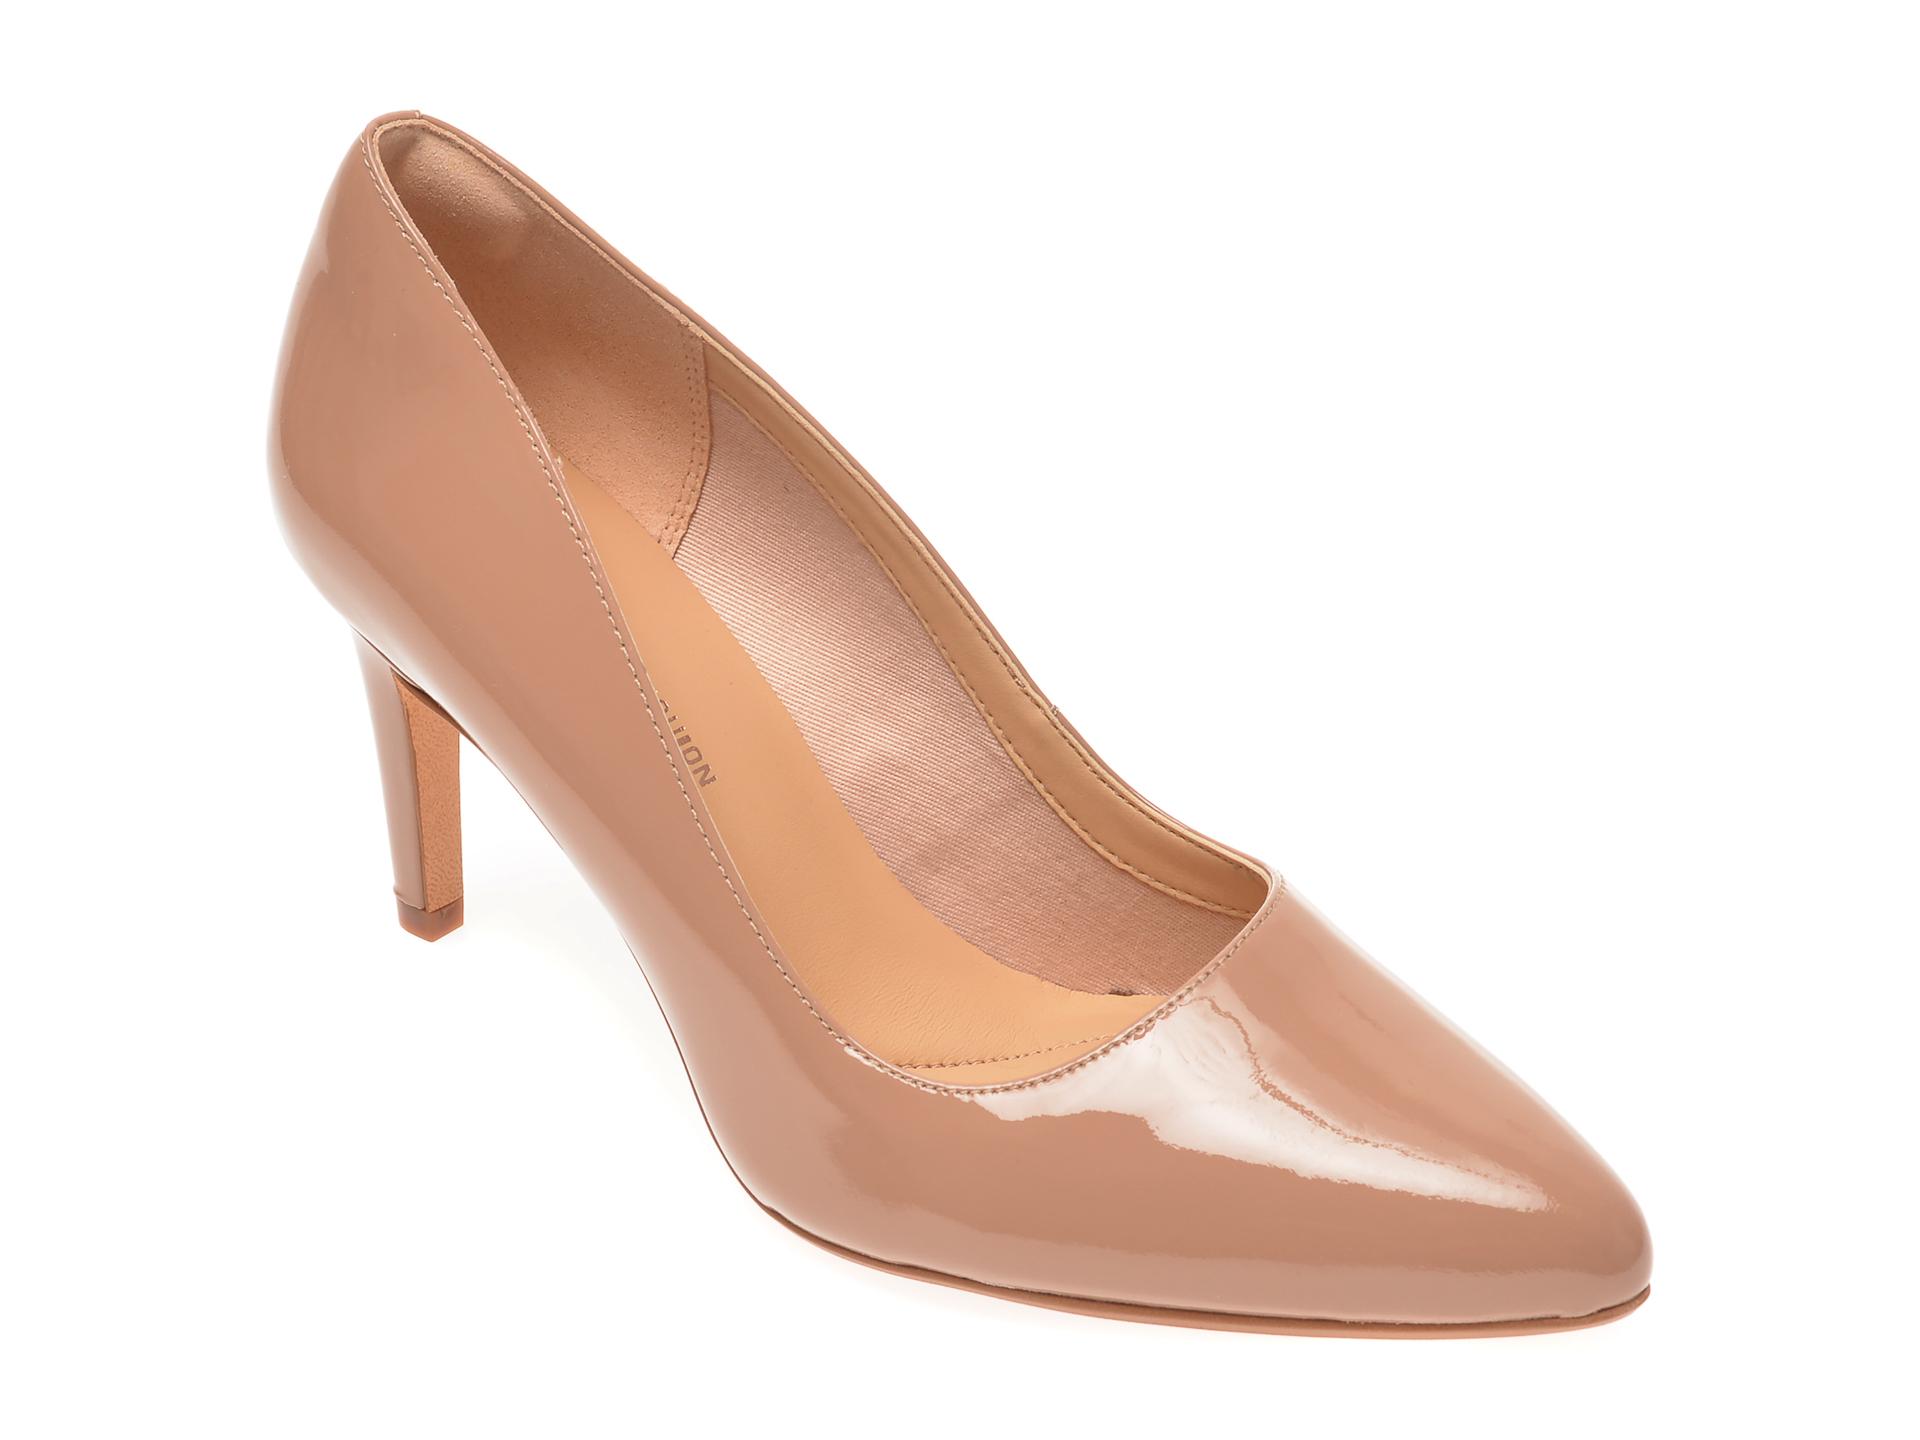 Pantofi CLARKS bej, Laina Rae, din piele naturala lacuita